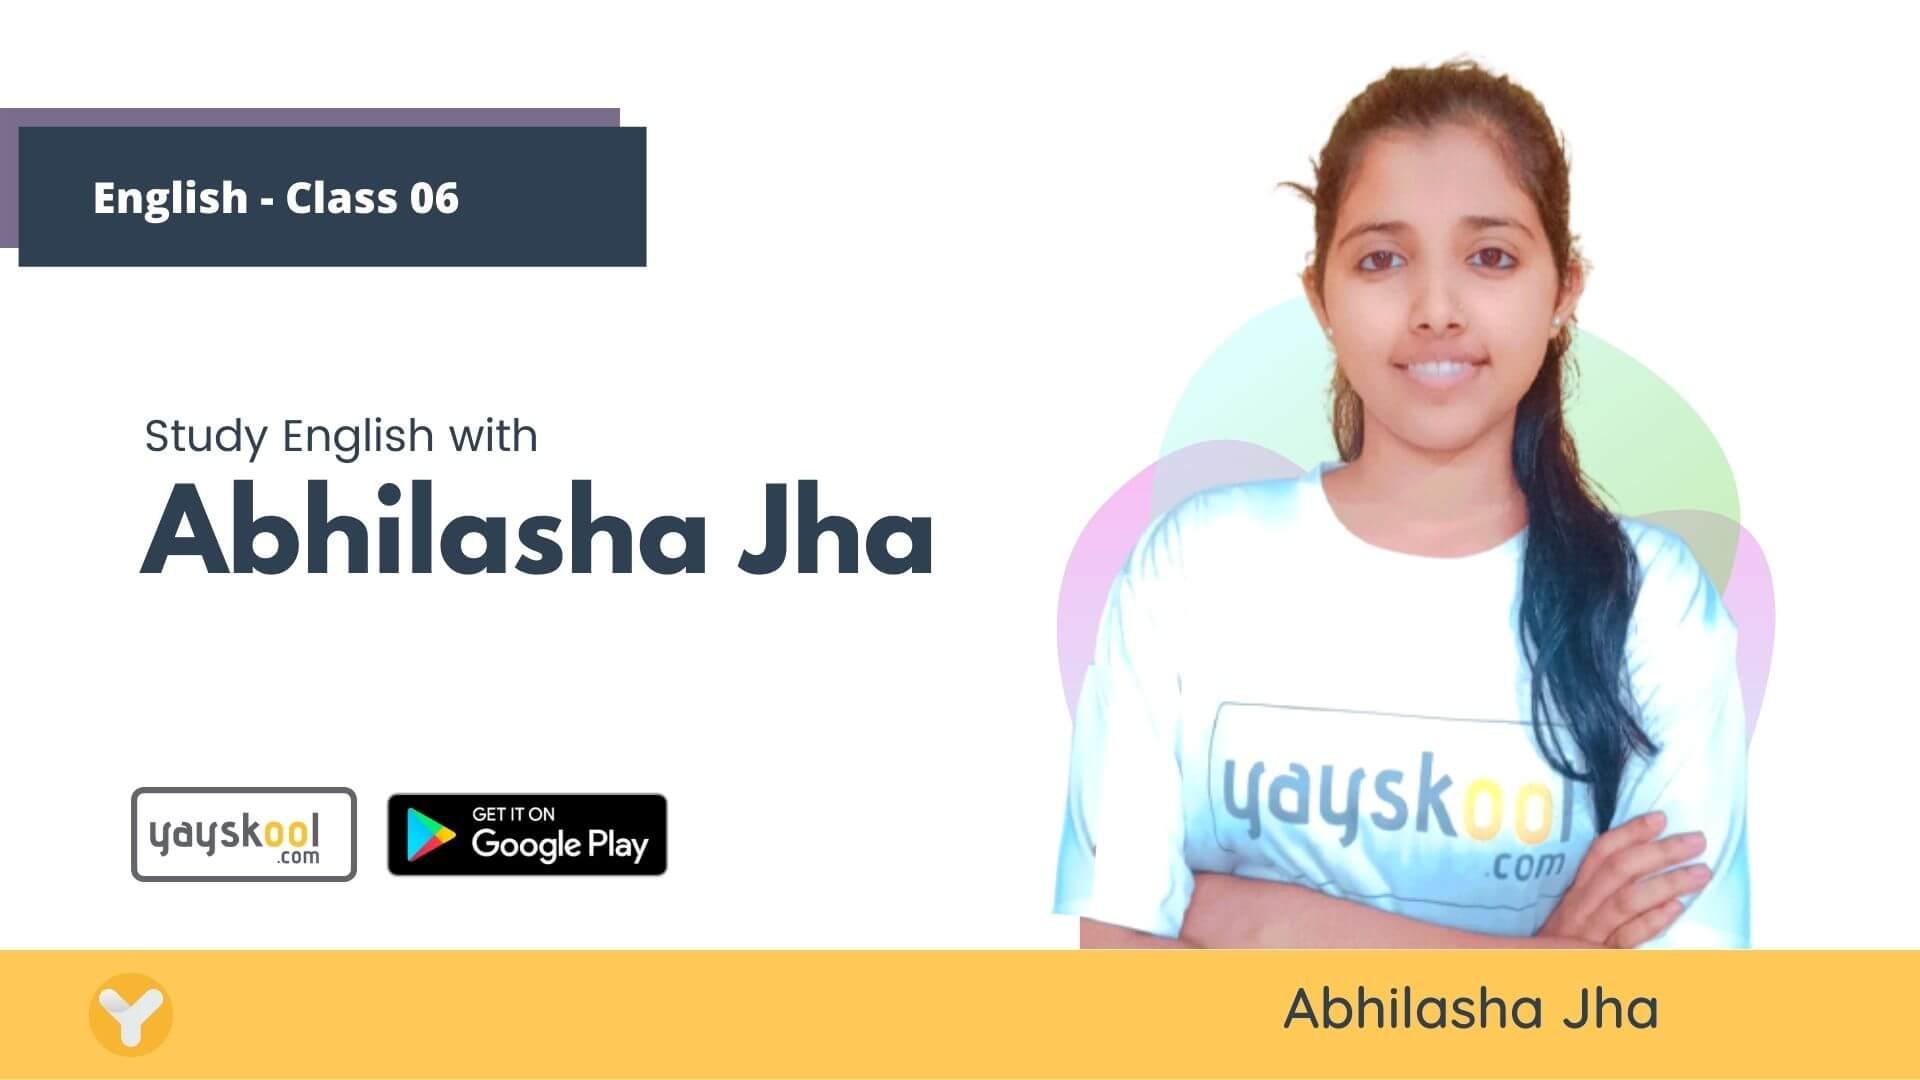 english-course-class06-abhilasha-jha